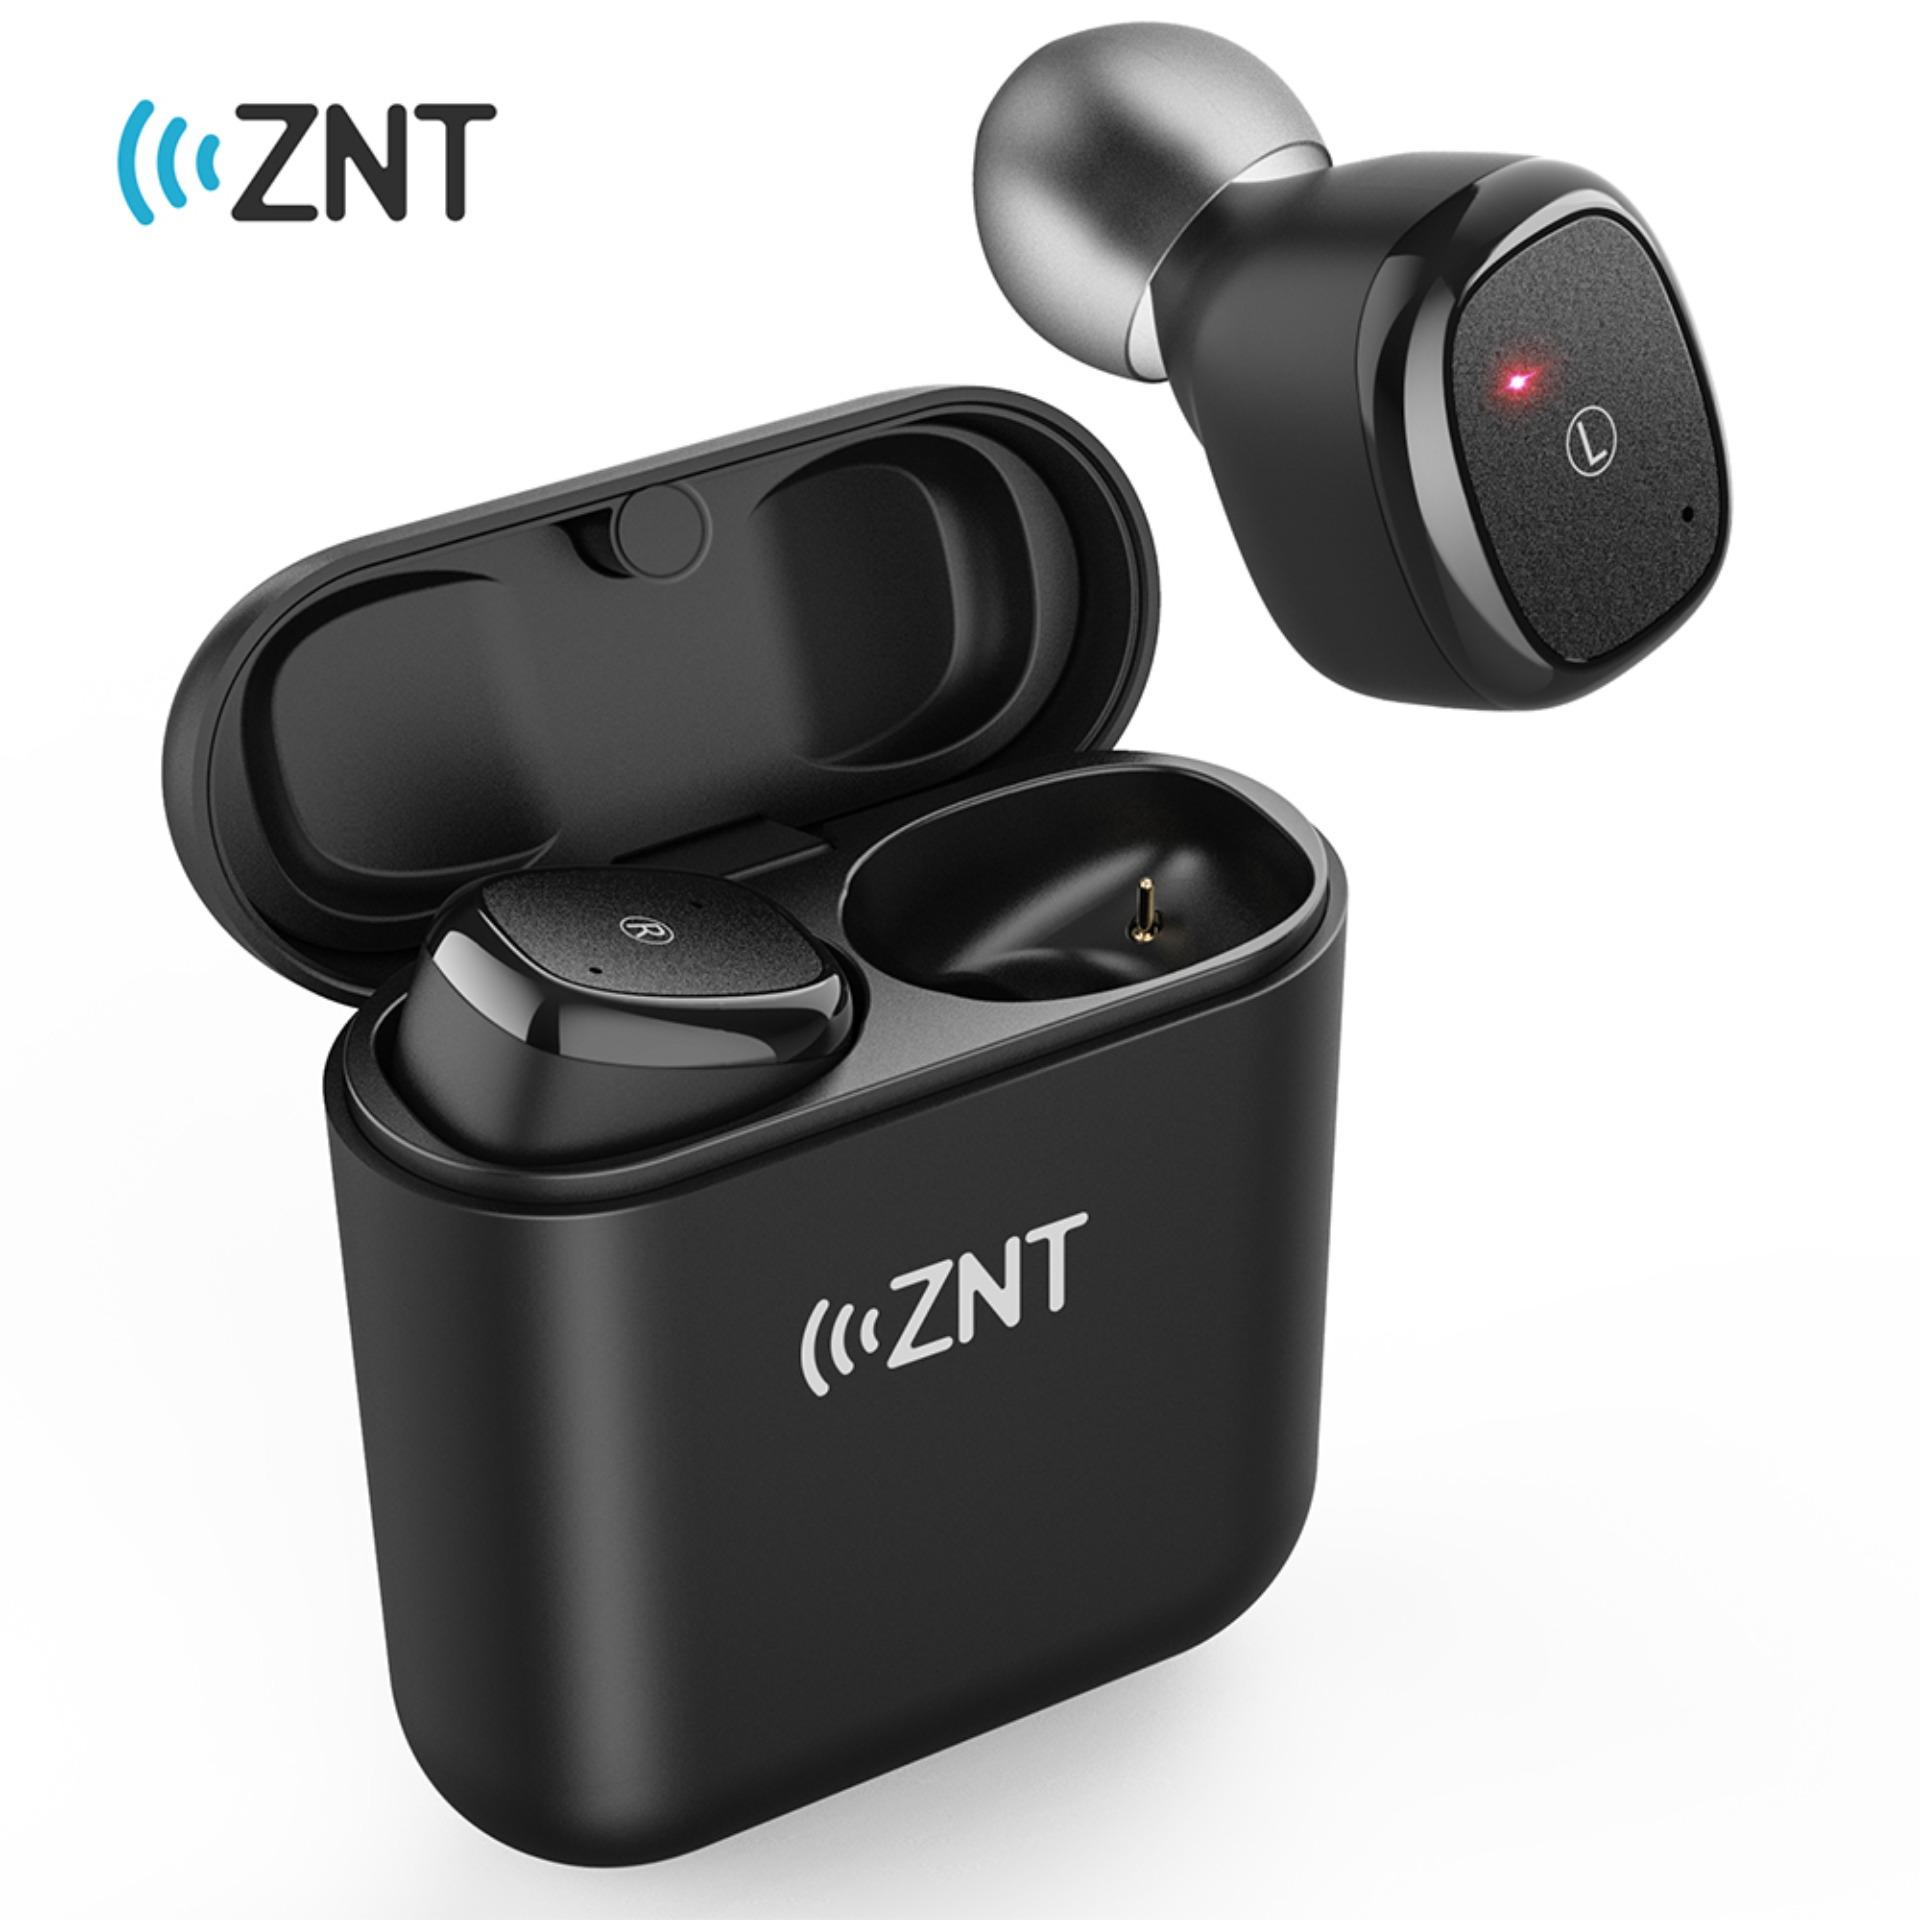 6f27ca0c557 ZNT D06-L True Wireless Earbuds with Bluetooth 5.0 and Hi-Fi Sound Quality